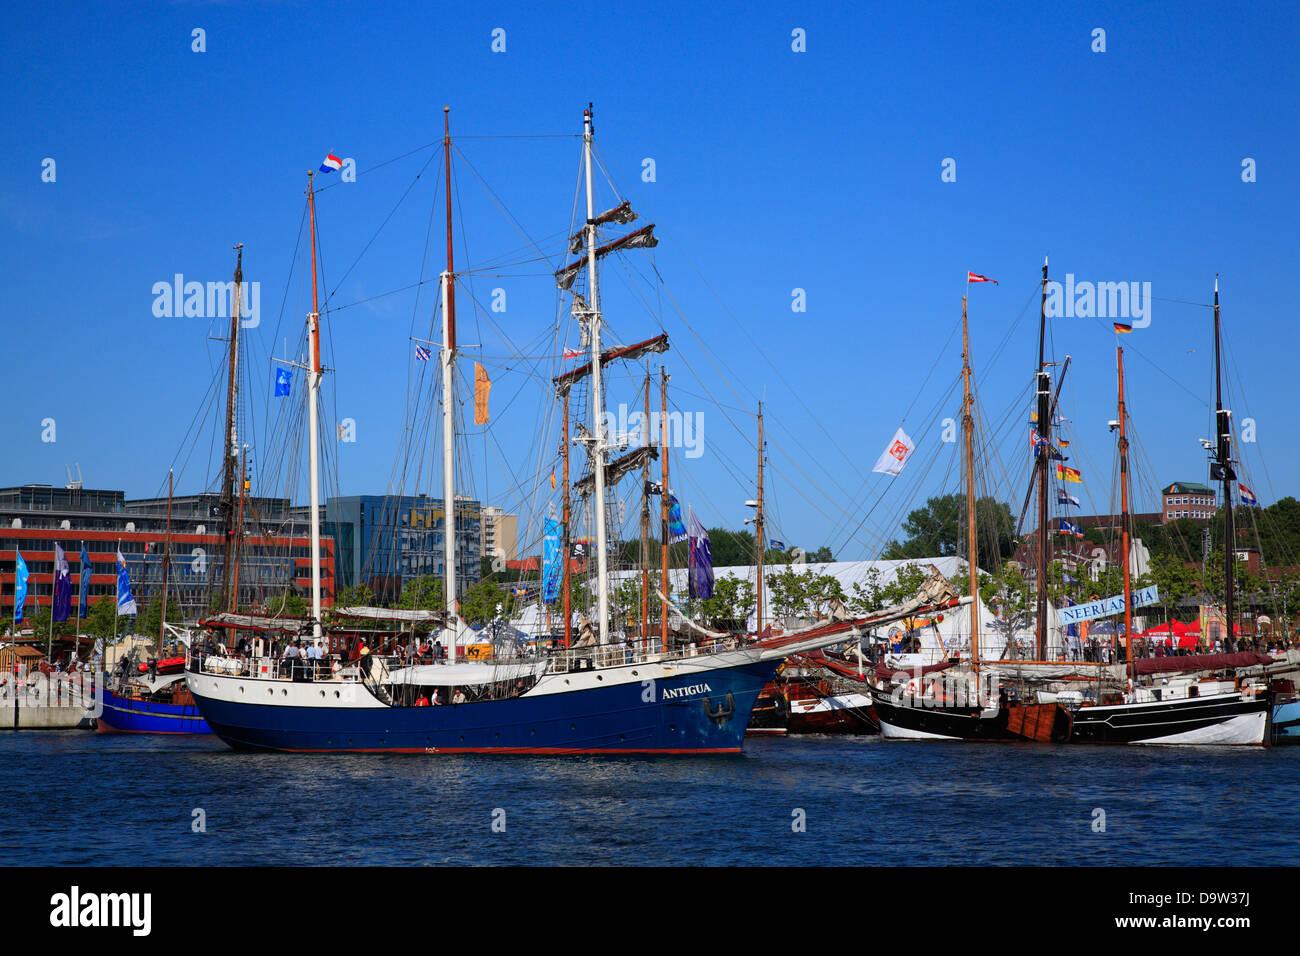 Sailing ships at Kiel harbor, Schleswig-Holstein, Germany, Europe - Stock Image